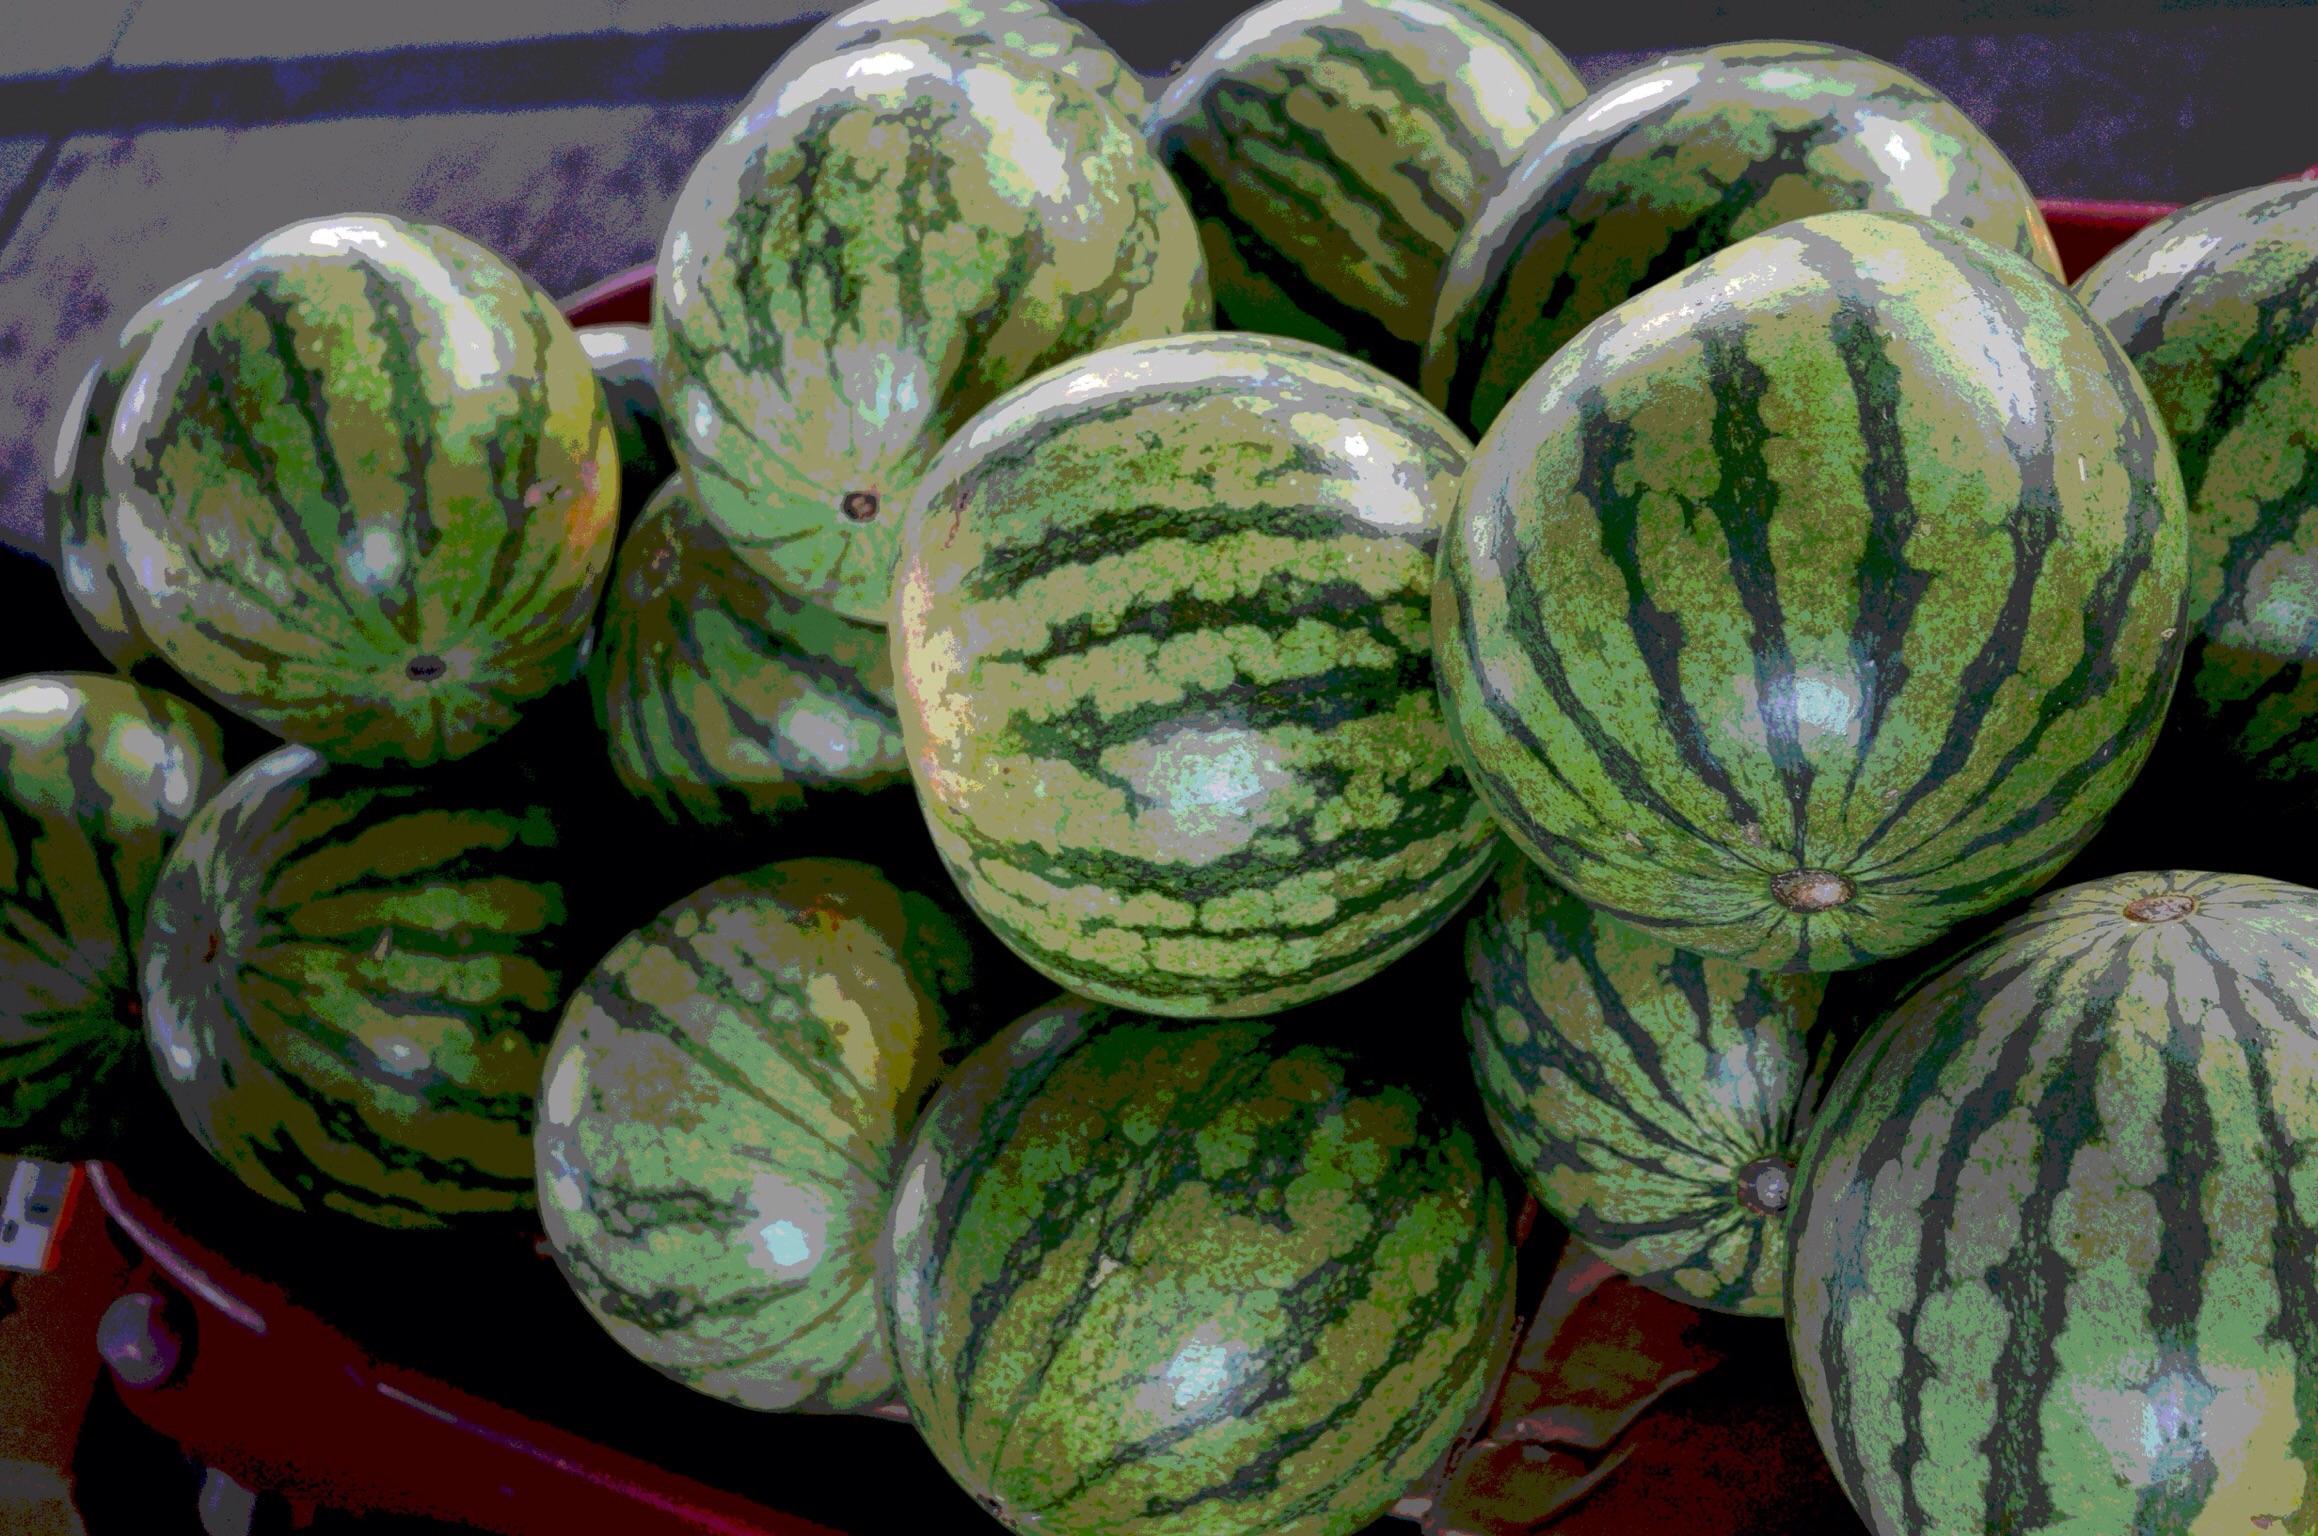 Watermelon from Dallas Farmers Market